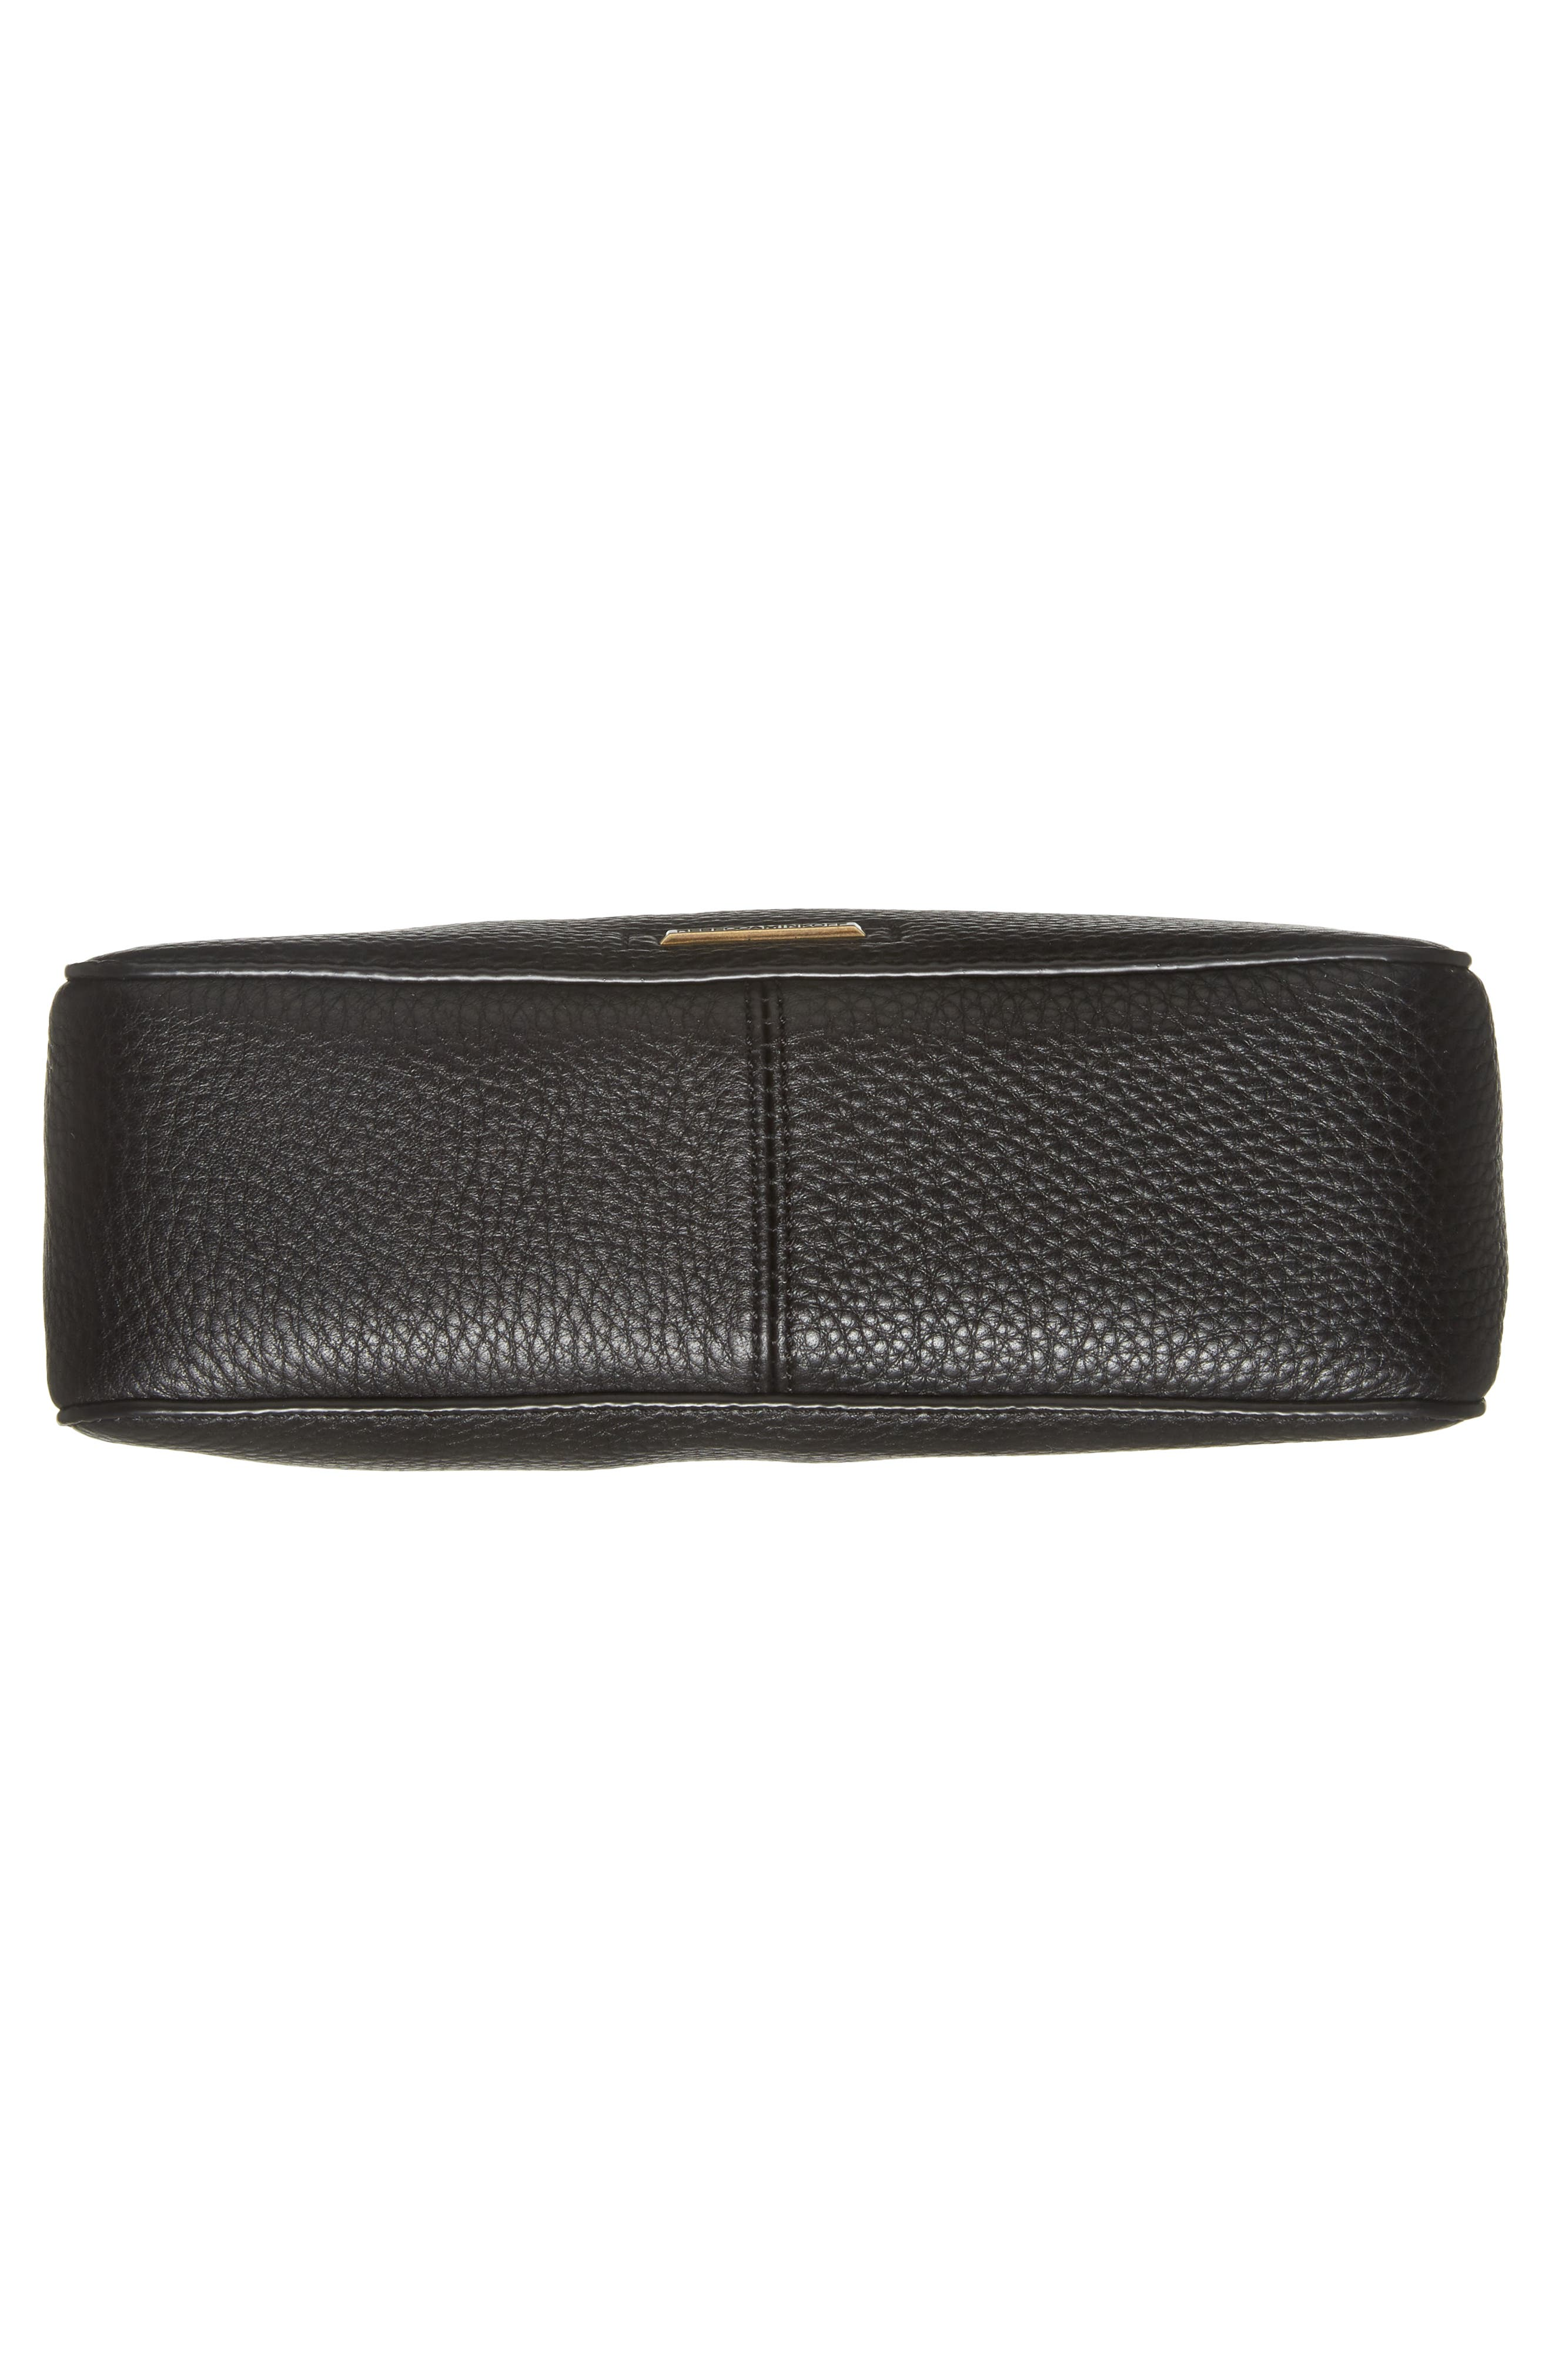 REBECCA MINKOFF, Small Darren Deerskin Leather Feed Bag, Alternate thumbnail 7, color, BLACK